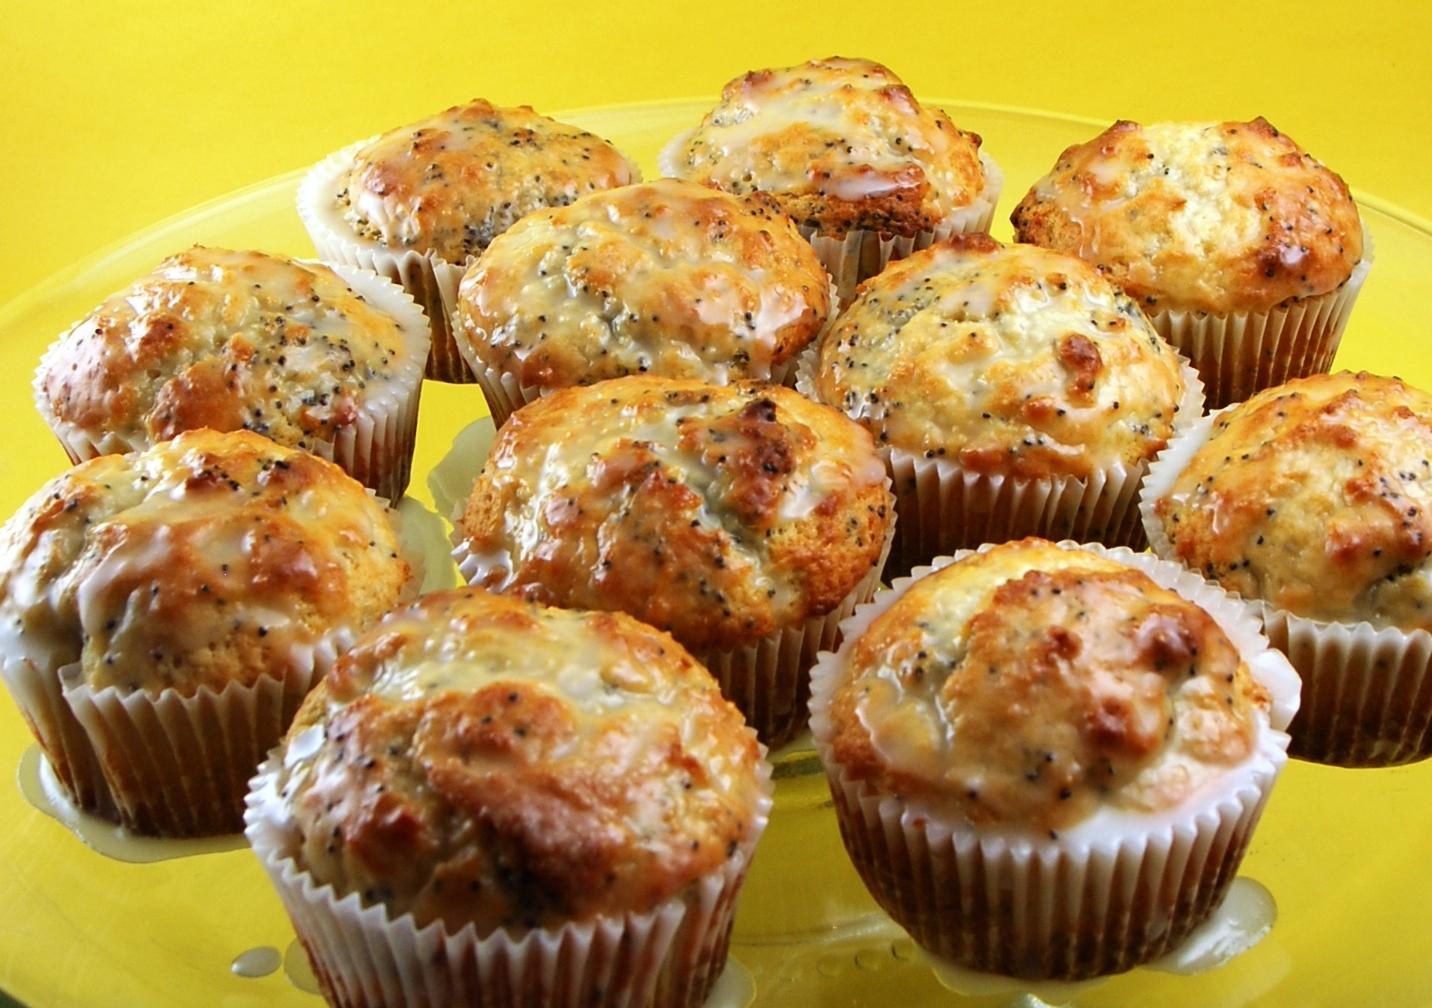 Lemon Poppy Seed Muffins with Lemon Glaze   Blissfully Delicious